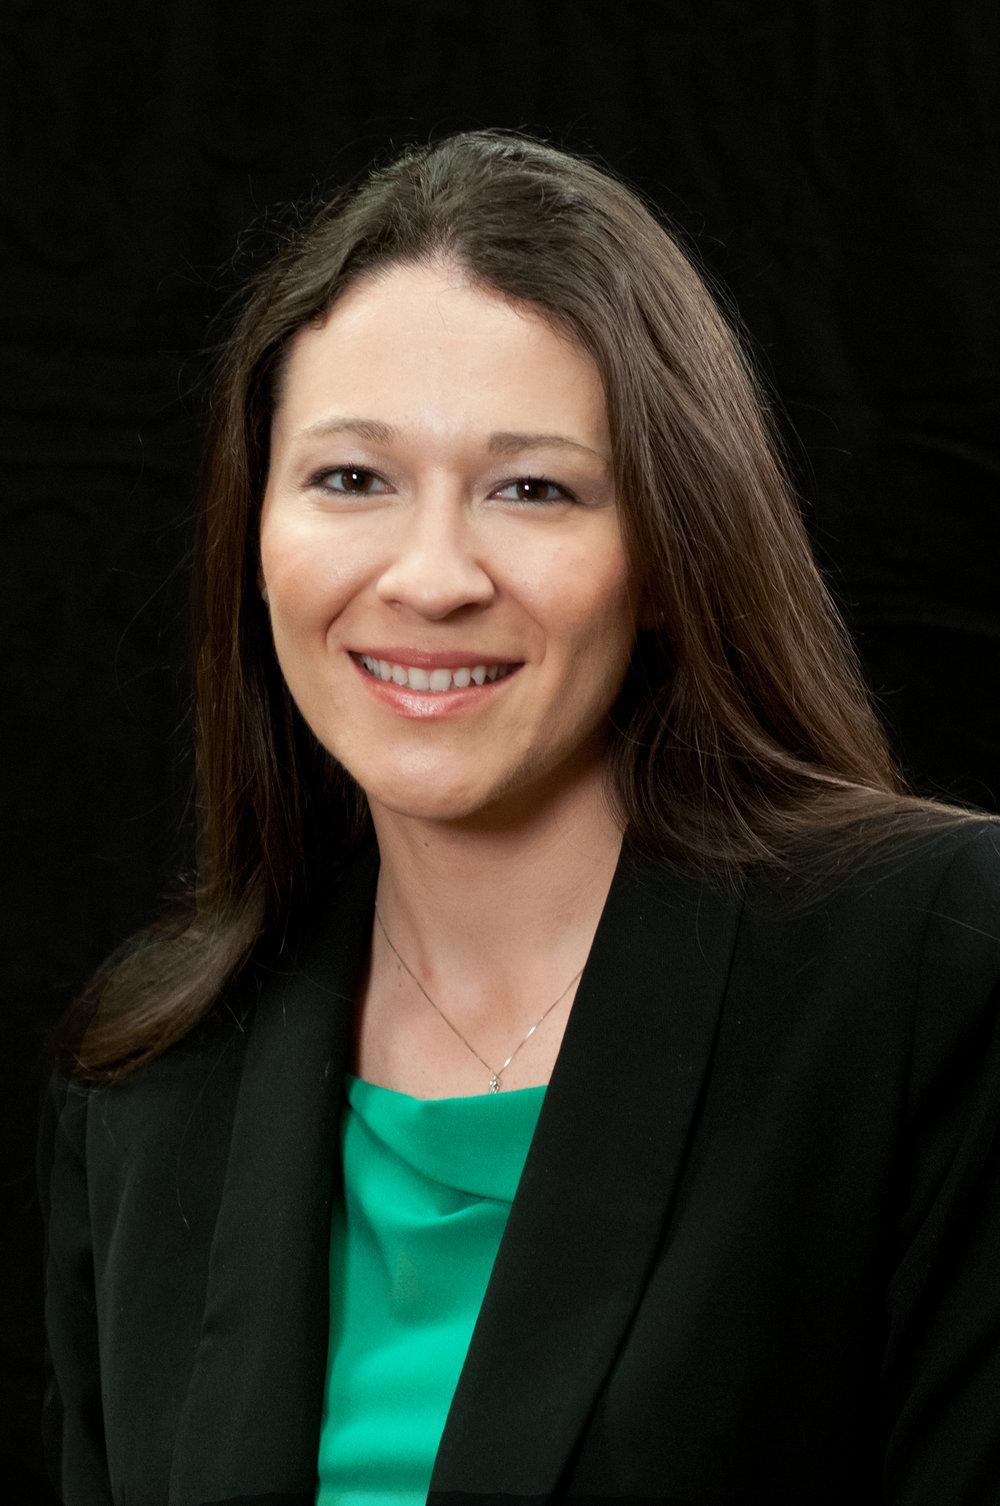 Nina M. Eiler